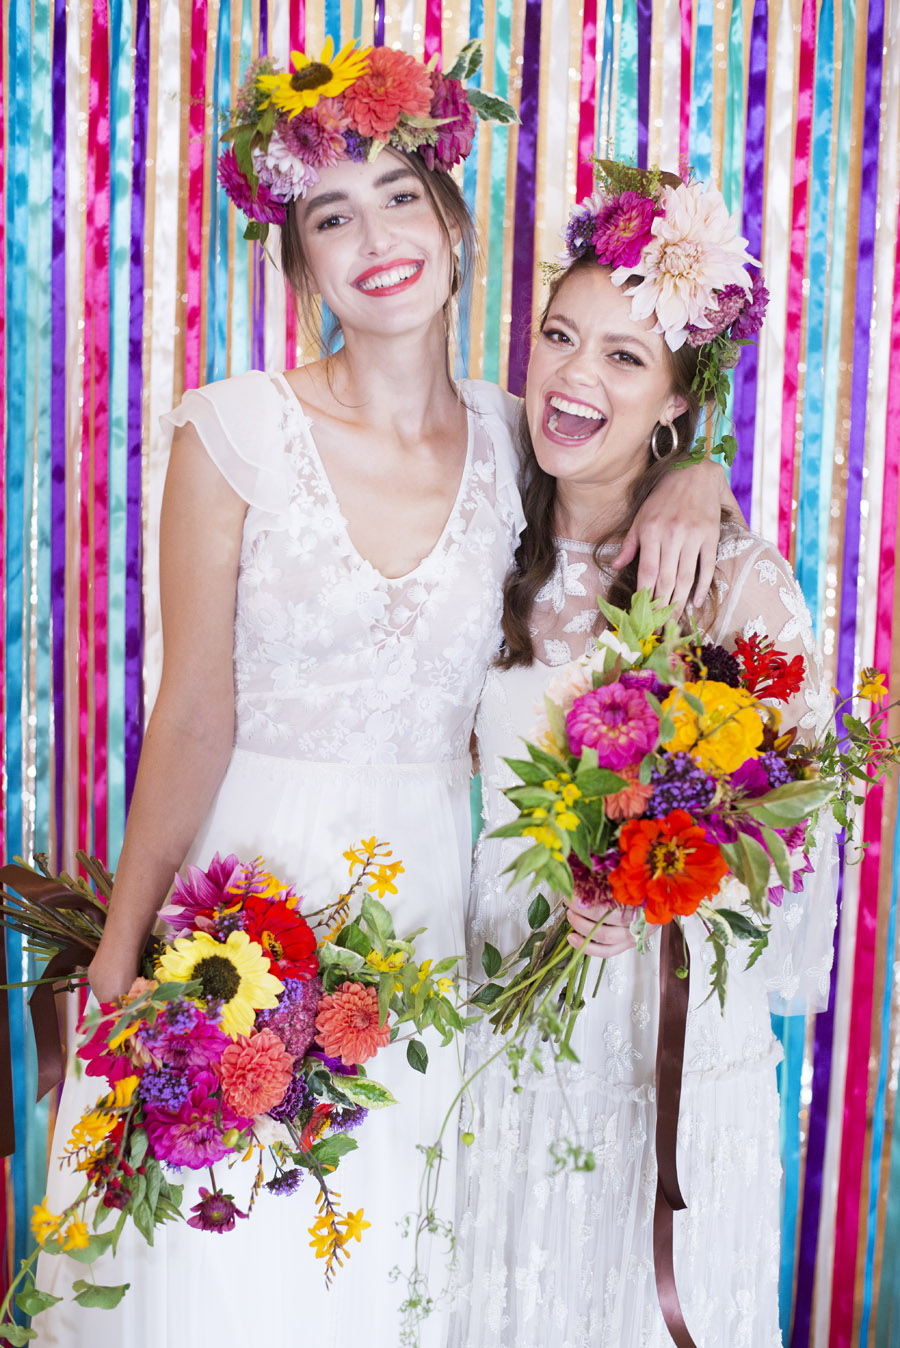 Same sex wedding styling boho chic festival inspiration - image credit Emma Hall Photography (8)